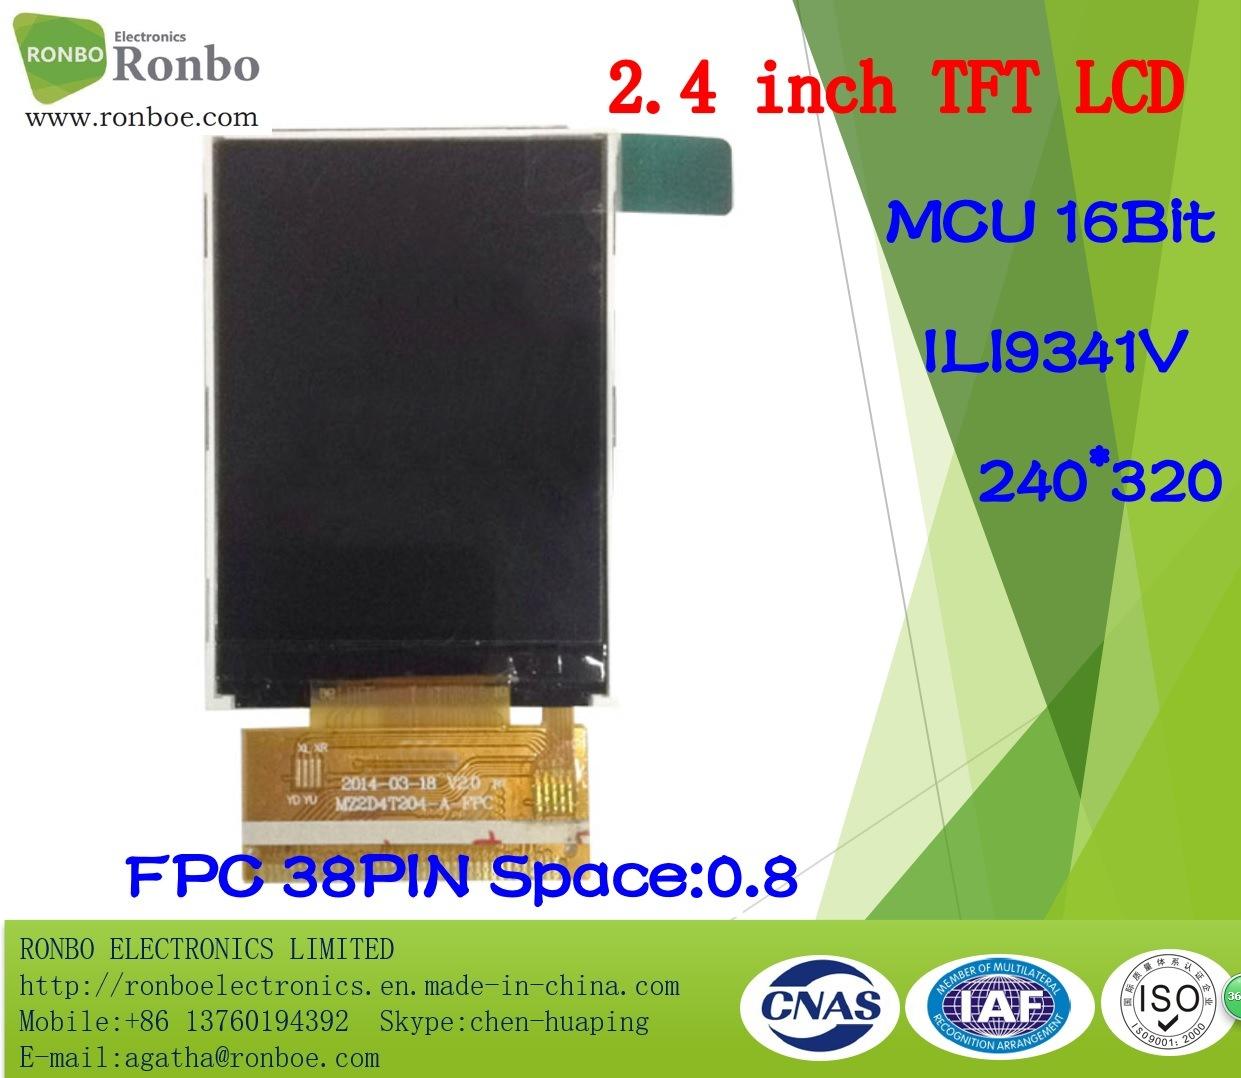 "2.4"" 240X320 MCU 16bit Option Touch Panel TFT LCD Screen Display"